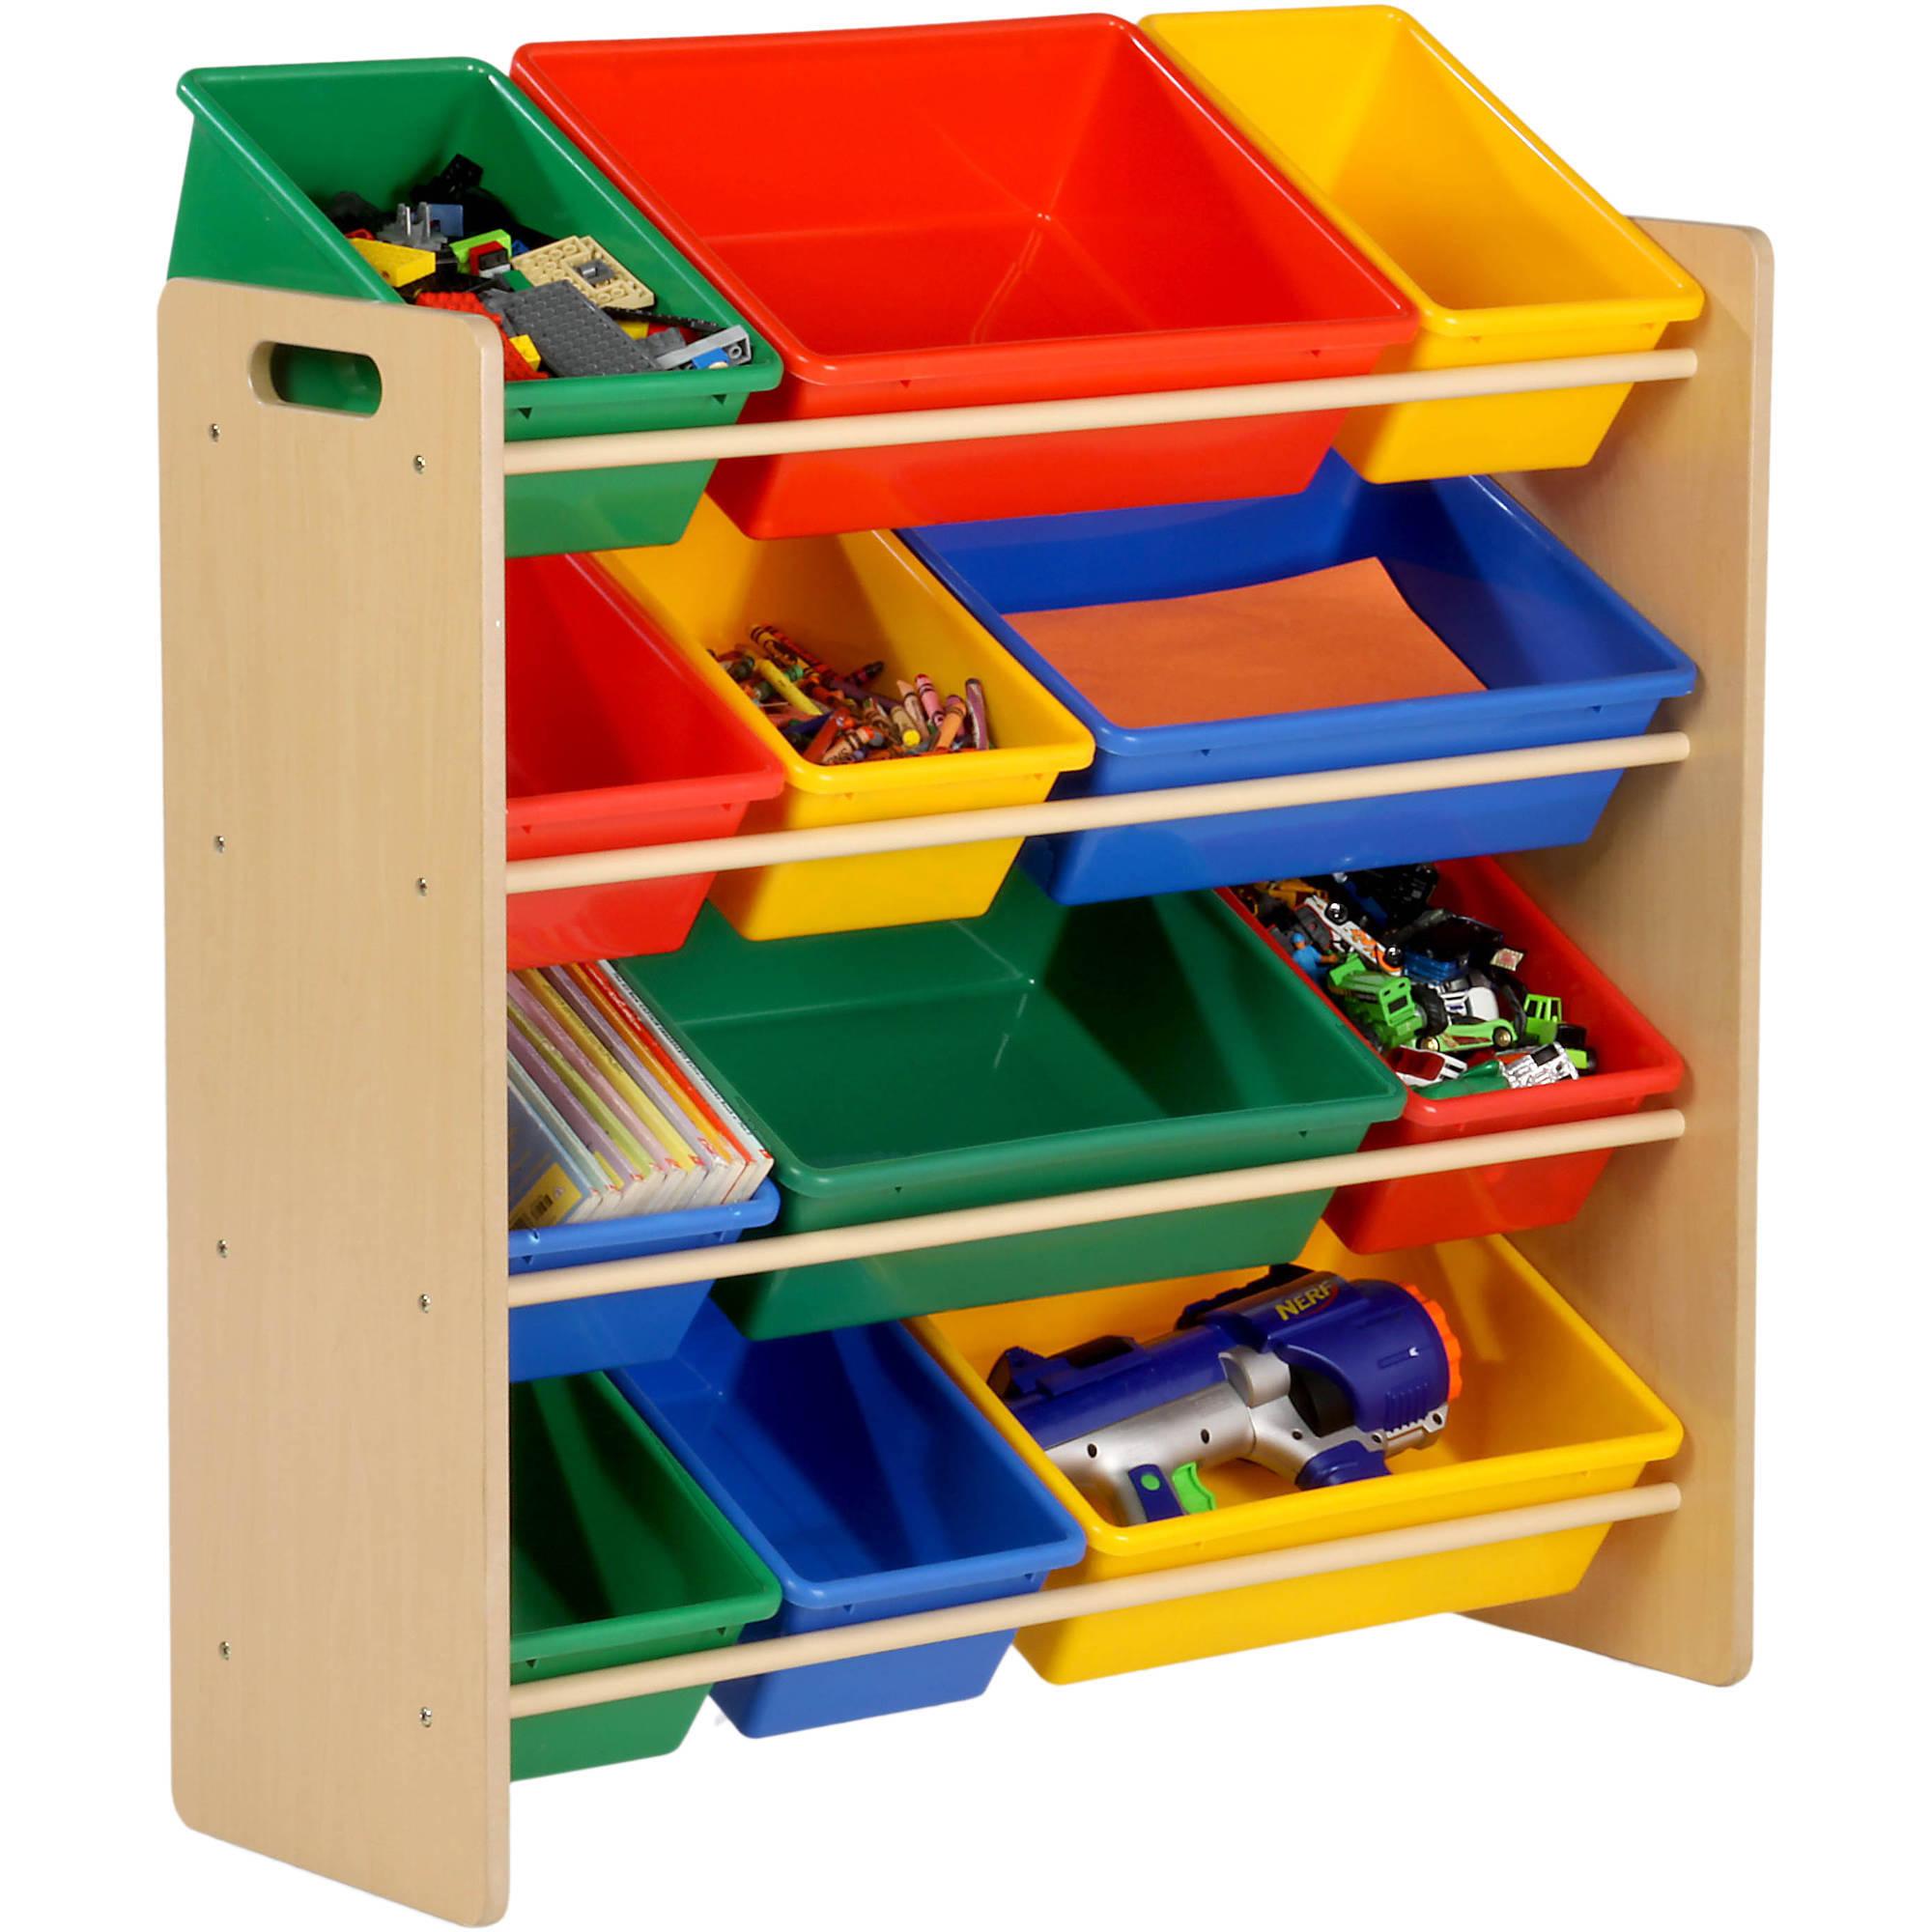 Child storage honey can do children's toy organizer and storage box, multi-color room RMQIKJY